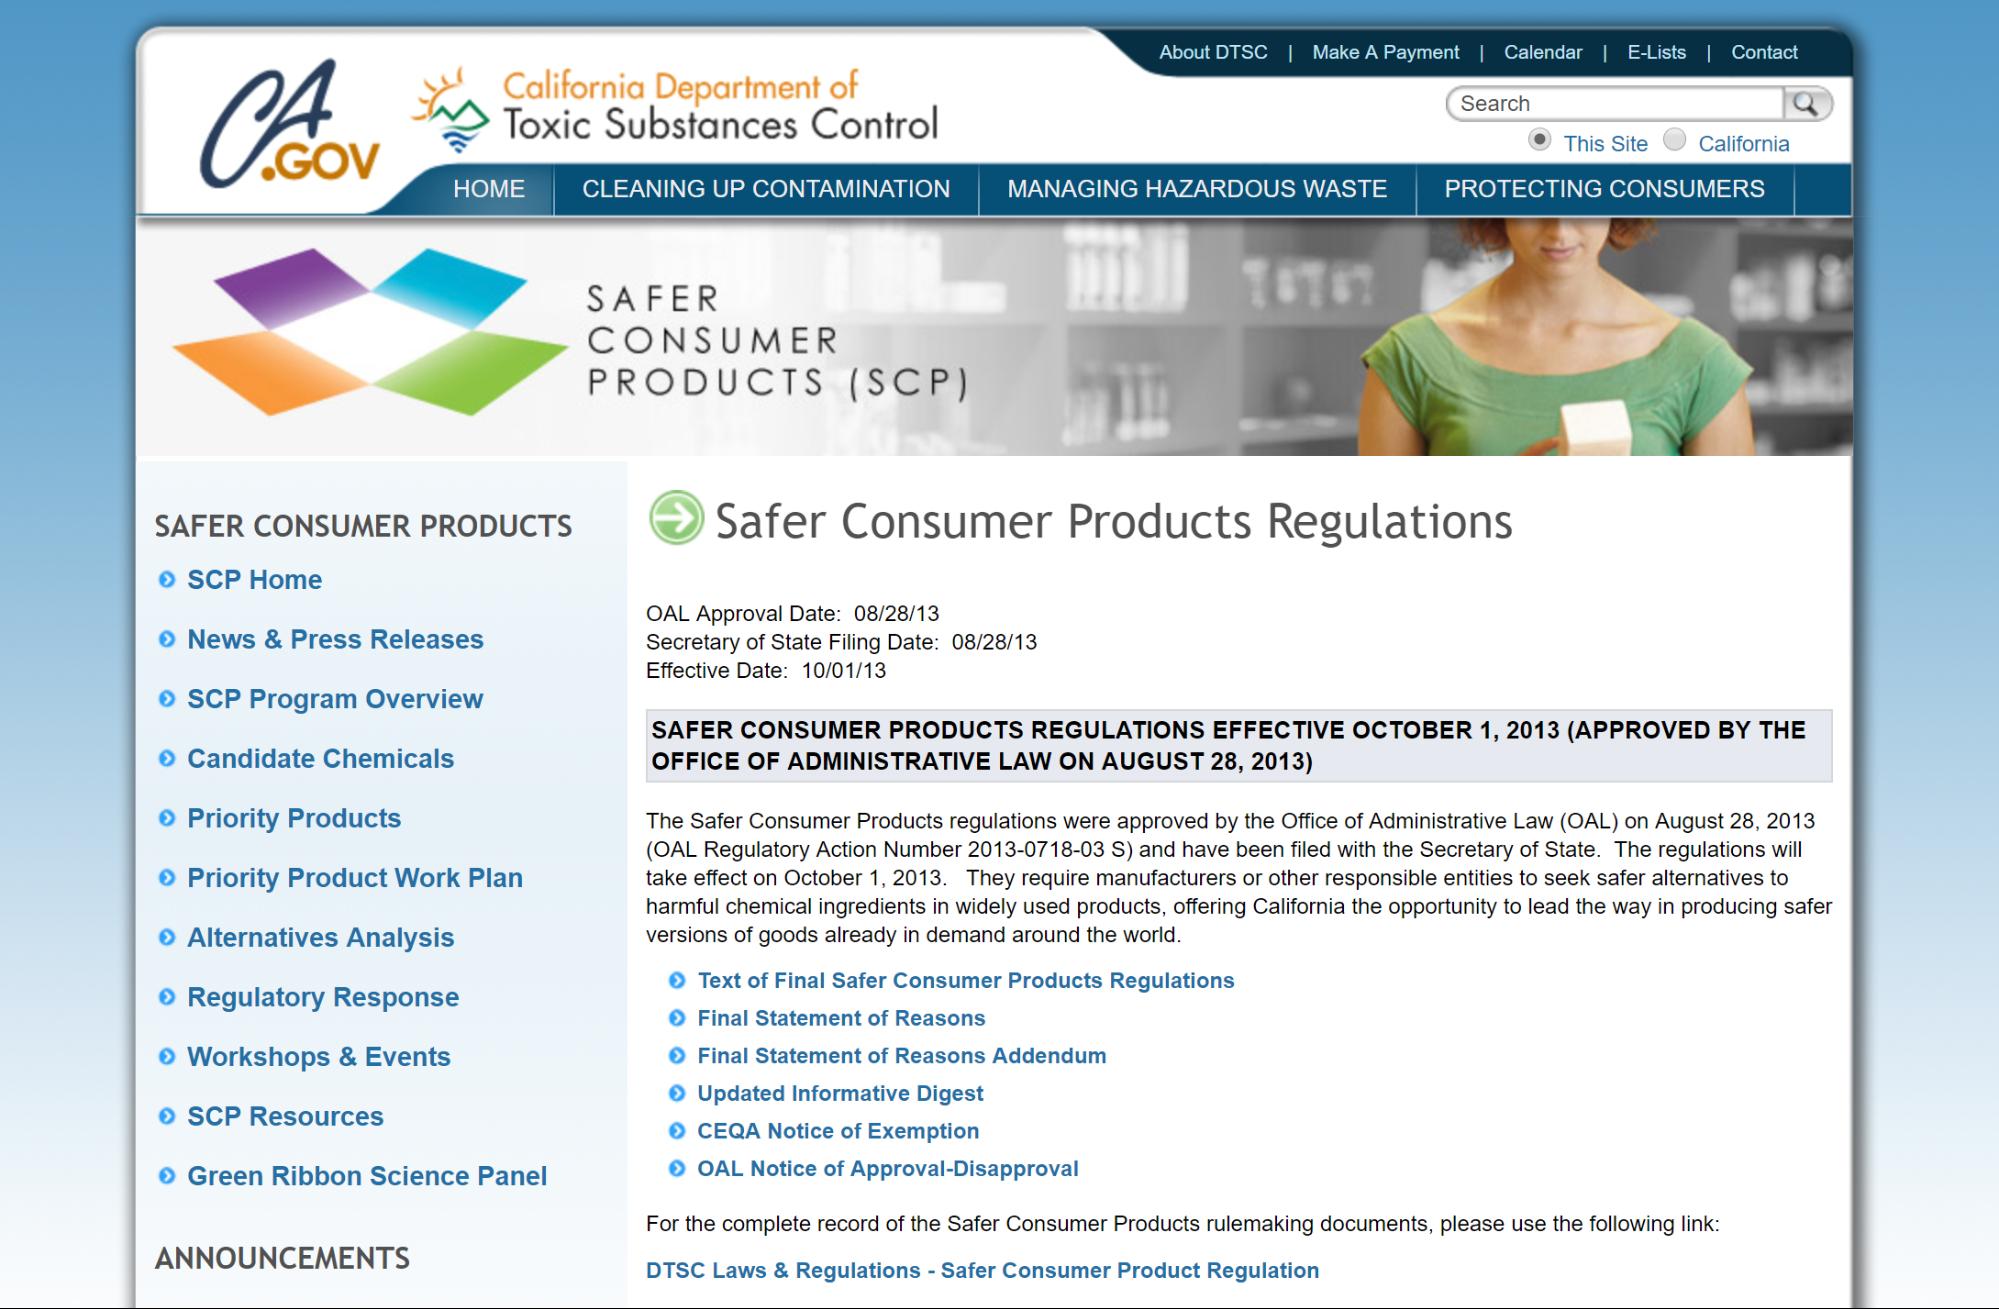 Screenshot showing consumer regulations for California